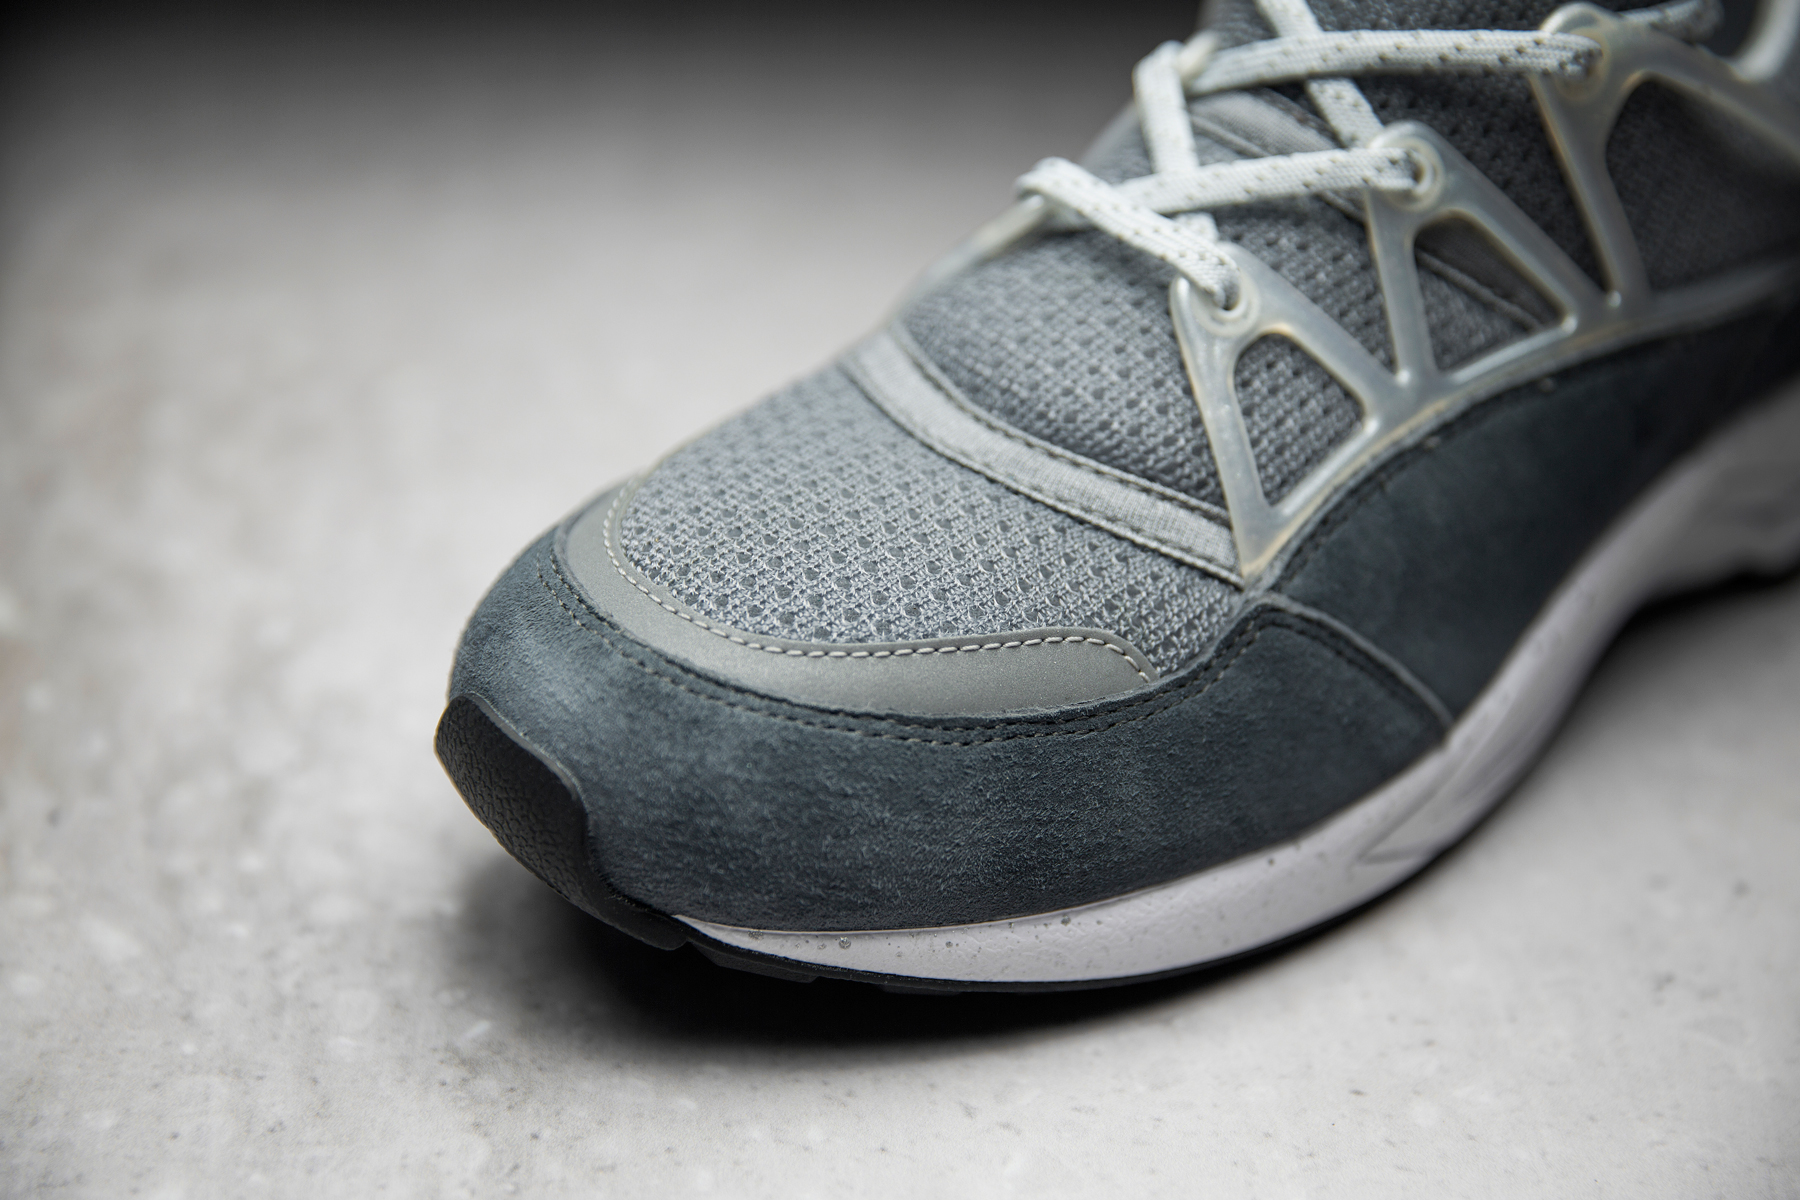 footpatrol x nike air huarache light concrete